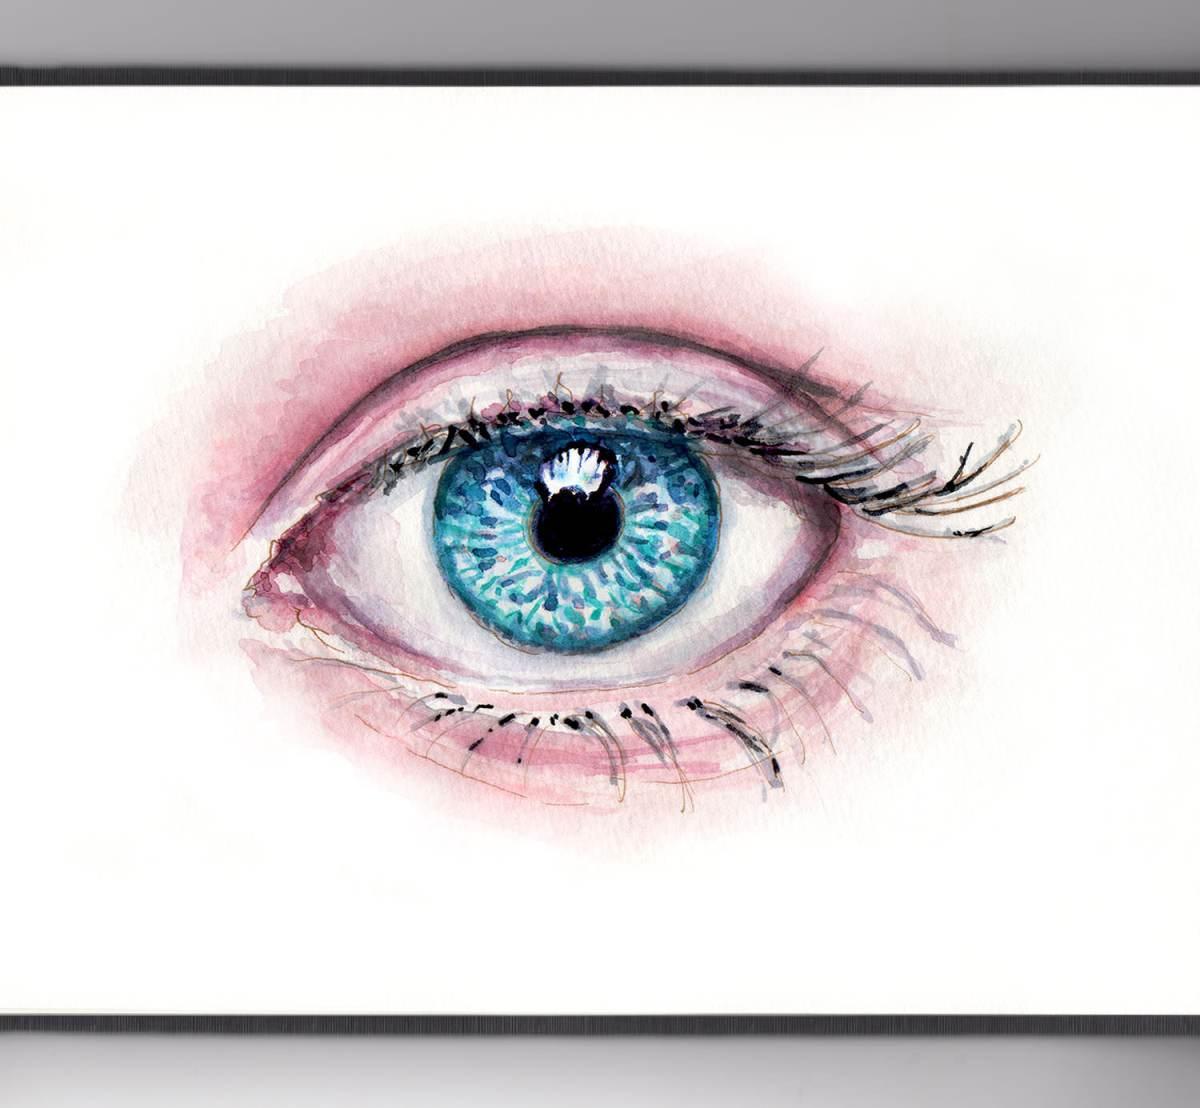 #WorldWatercolorGroup - Day 20 - My Favorite Body Part - Watercolor Blue Eyes - Doodlewash